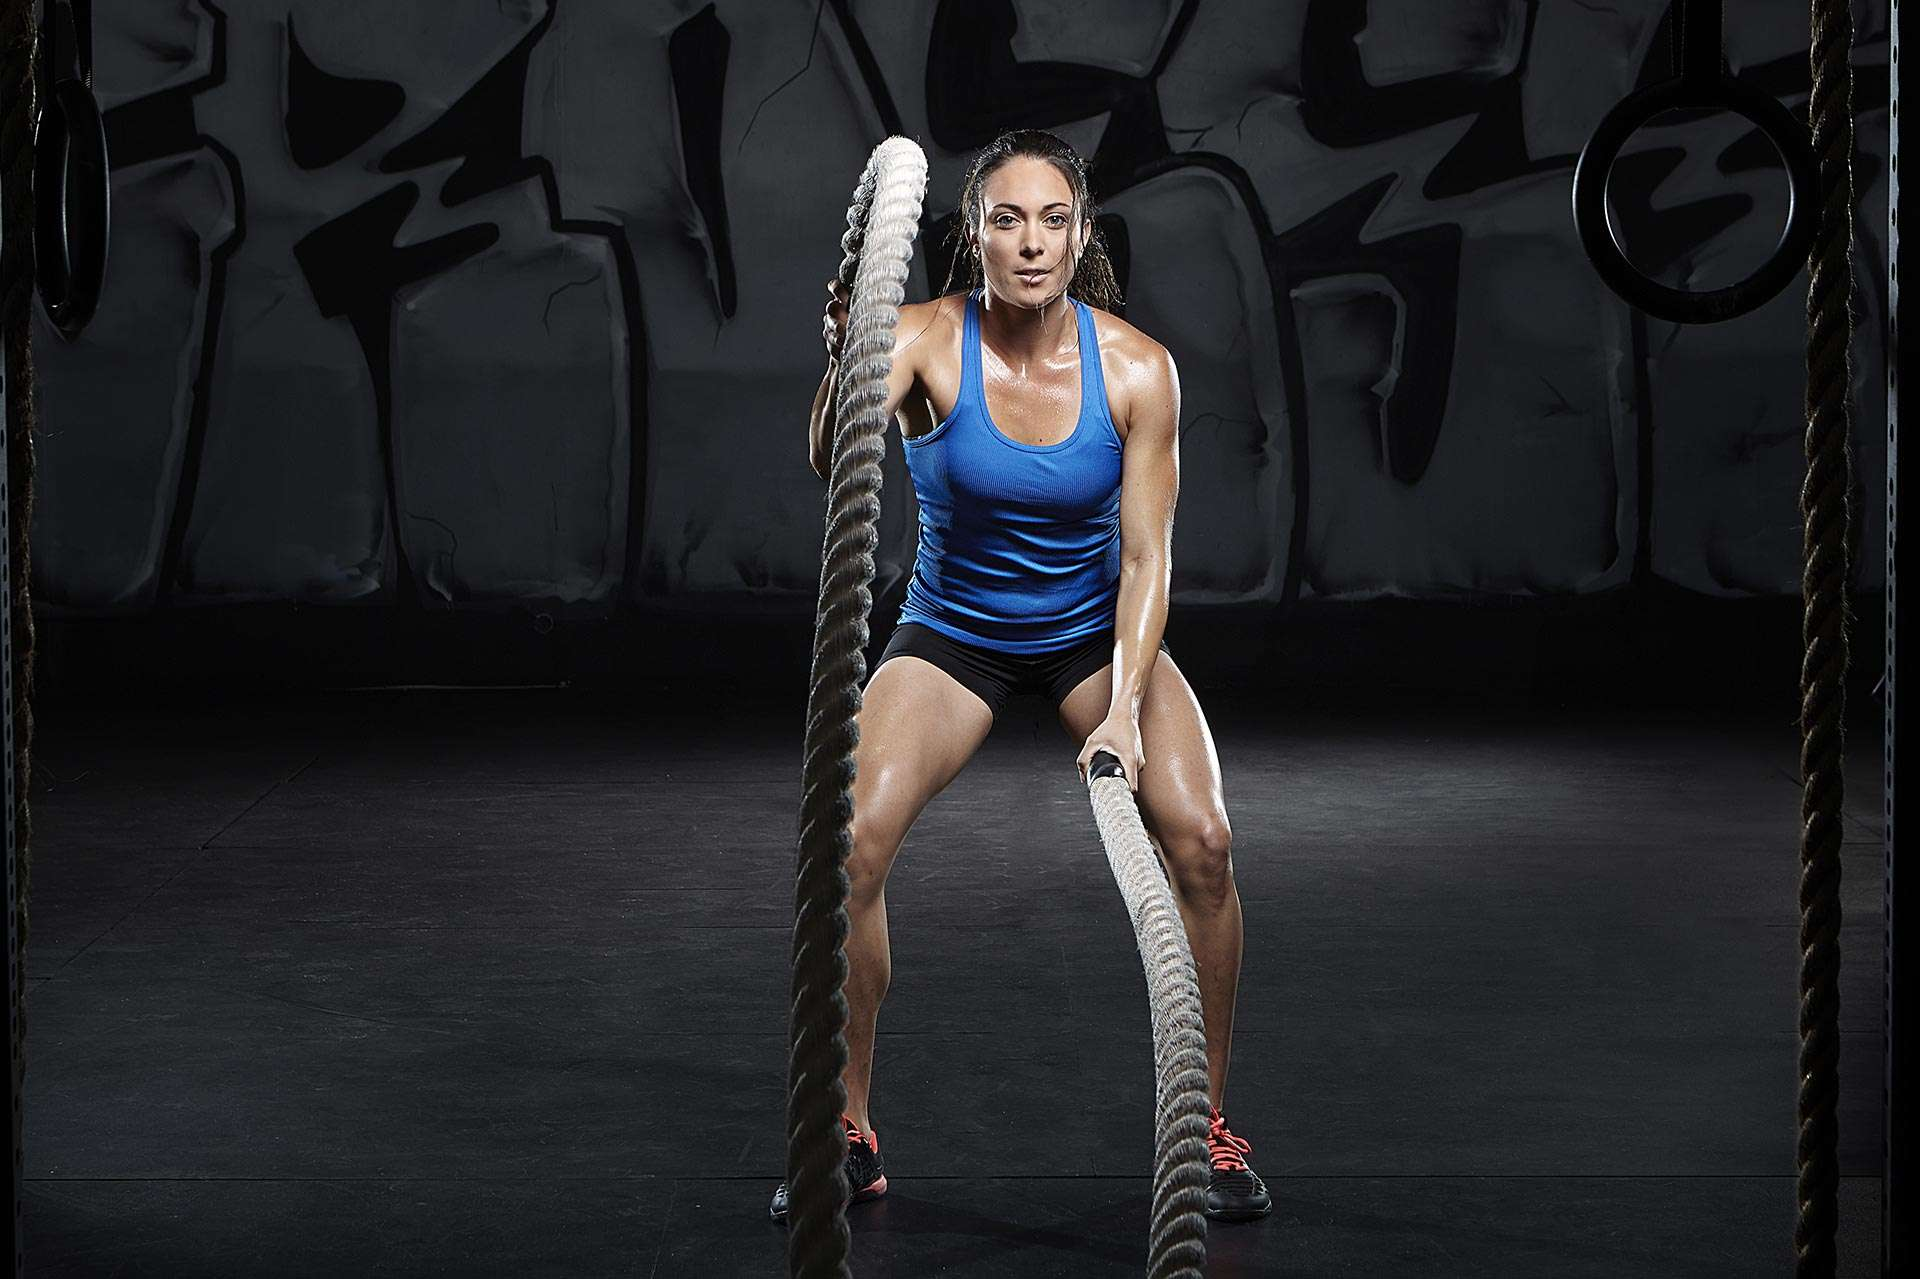 Action Sports Athlete Photography Lionshead Studios